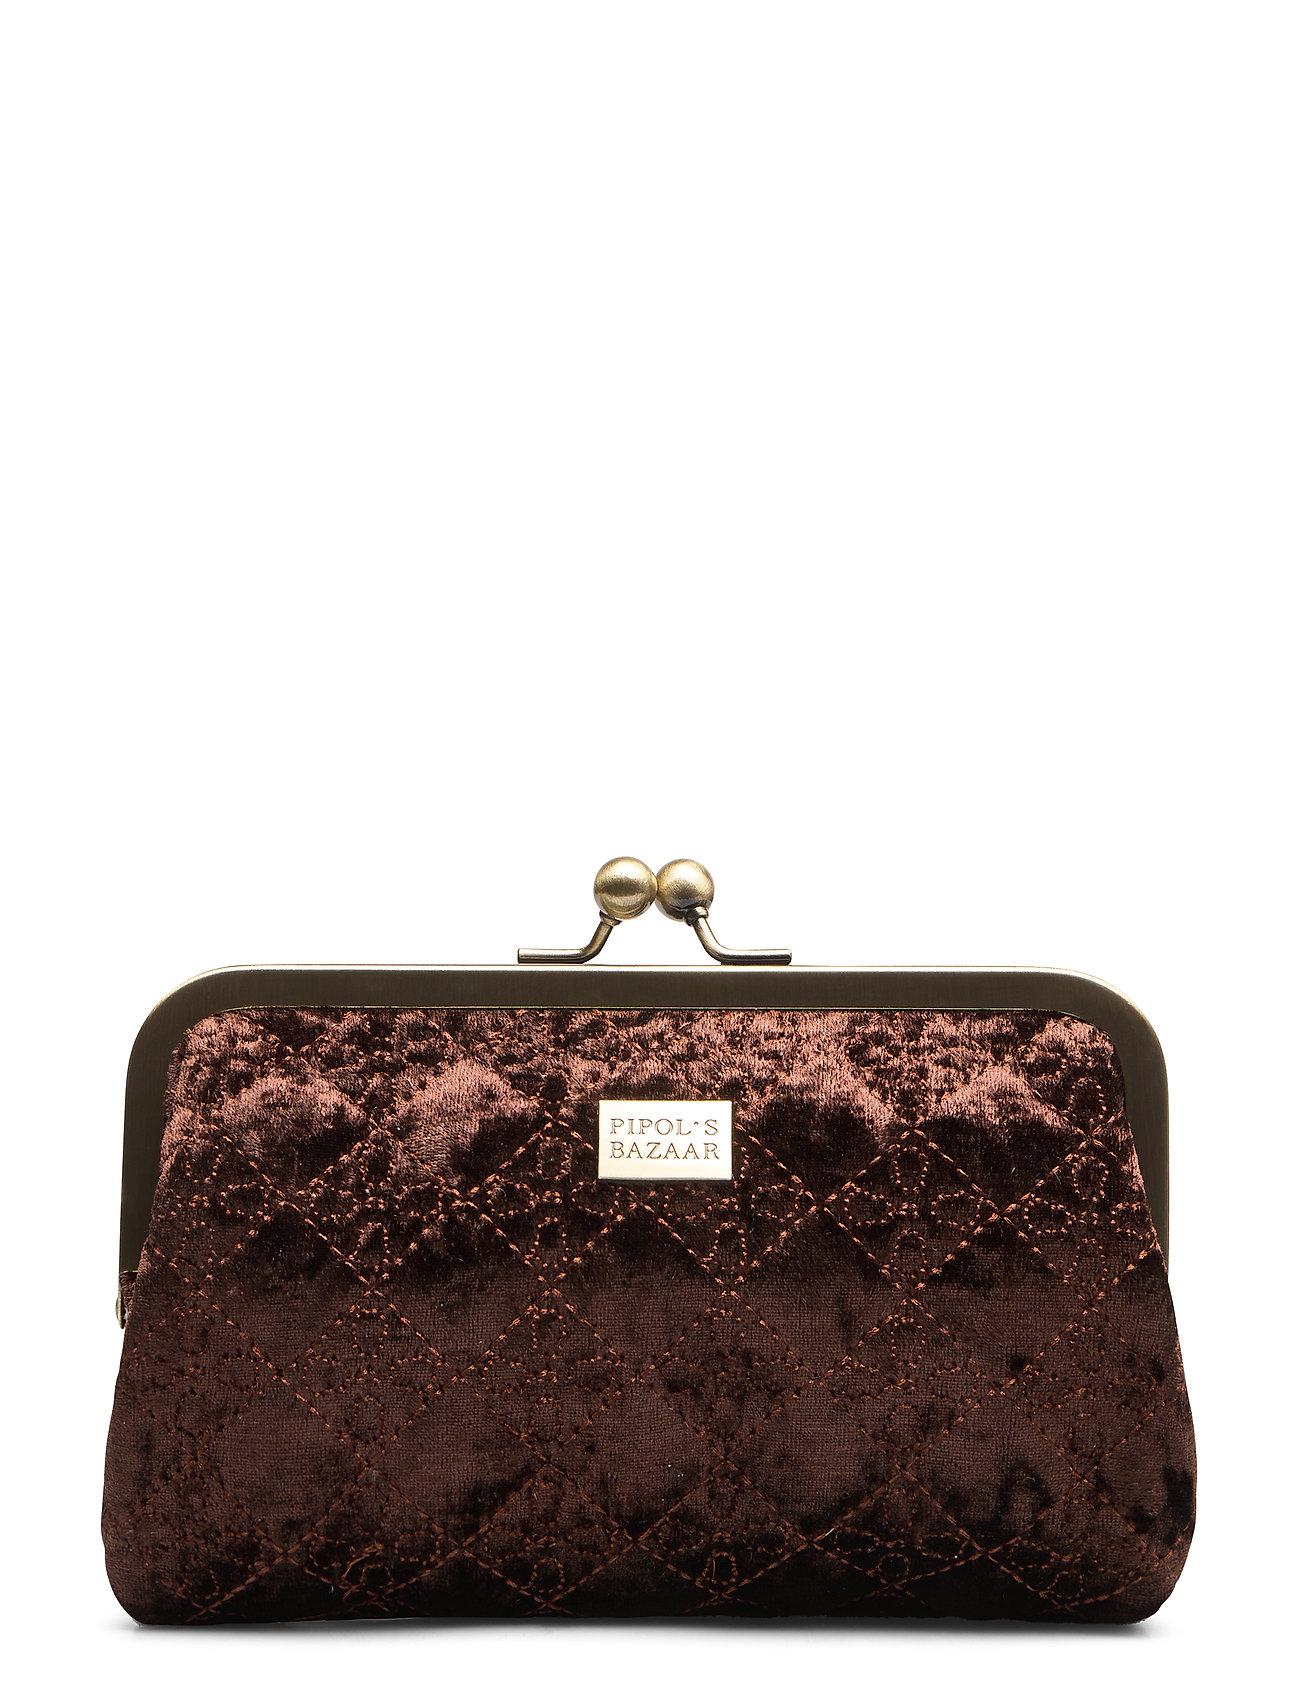 PIPOL'S BAZAAR Velvet Logo PIPOL Cosmetic Frame Chocolate - BROWN